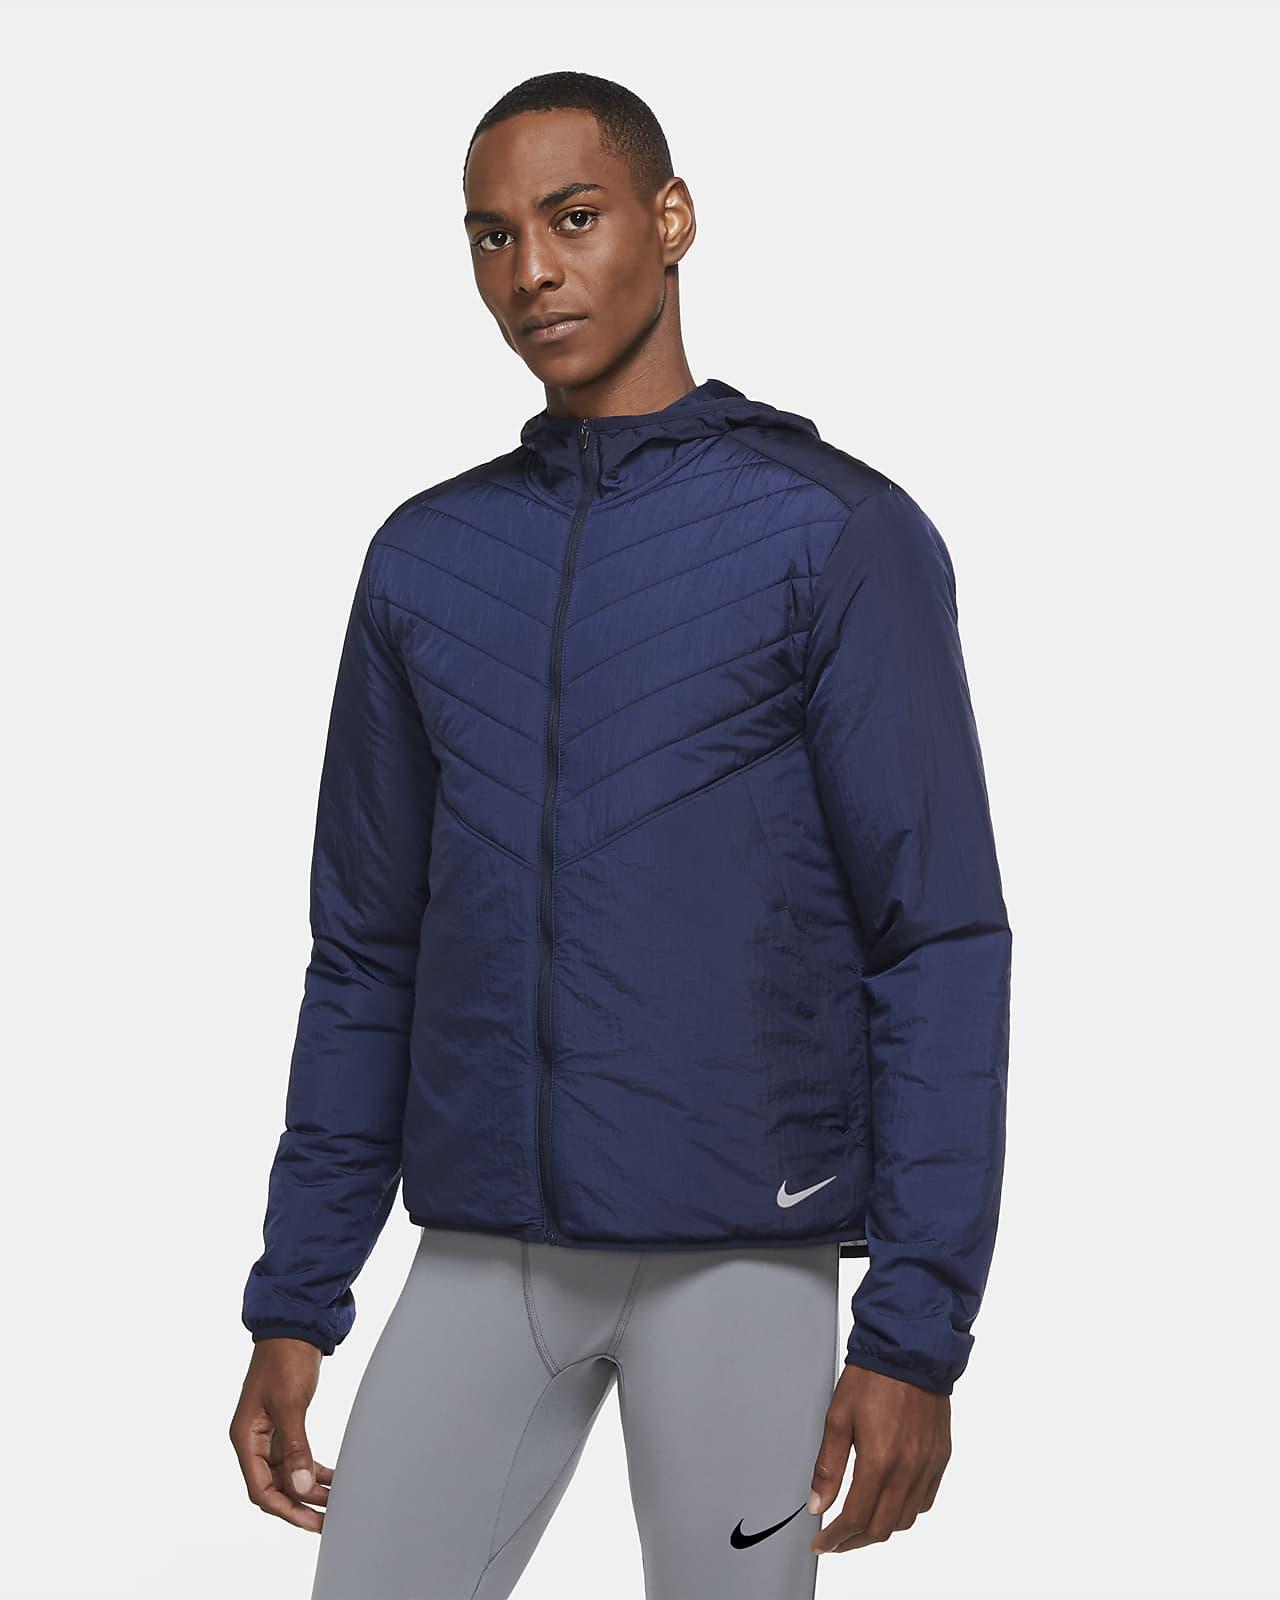 Veste de running Nike Aerolayer pour Homme